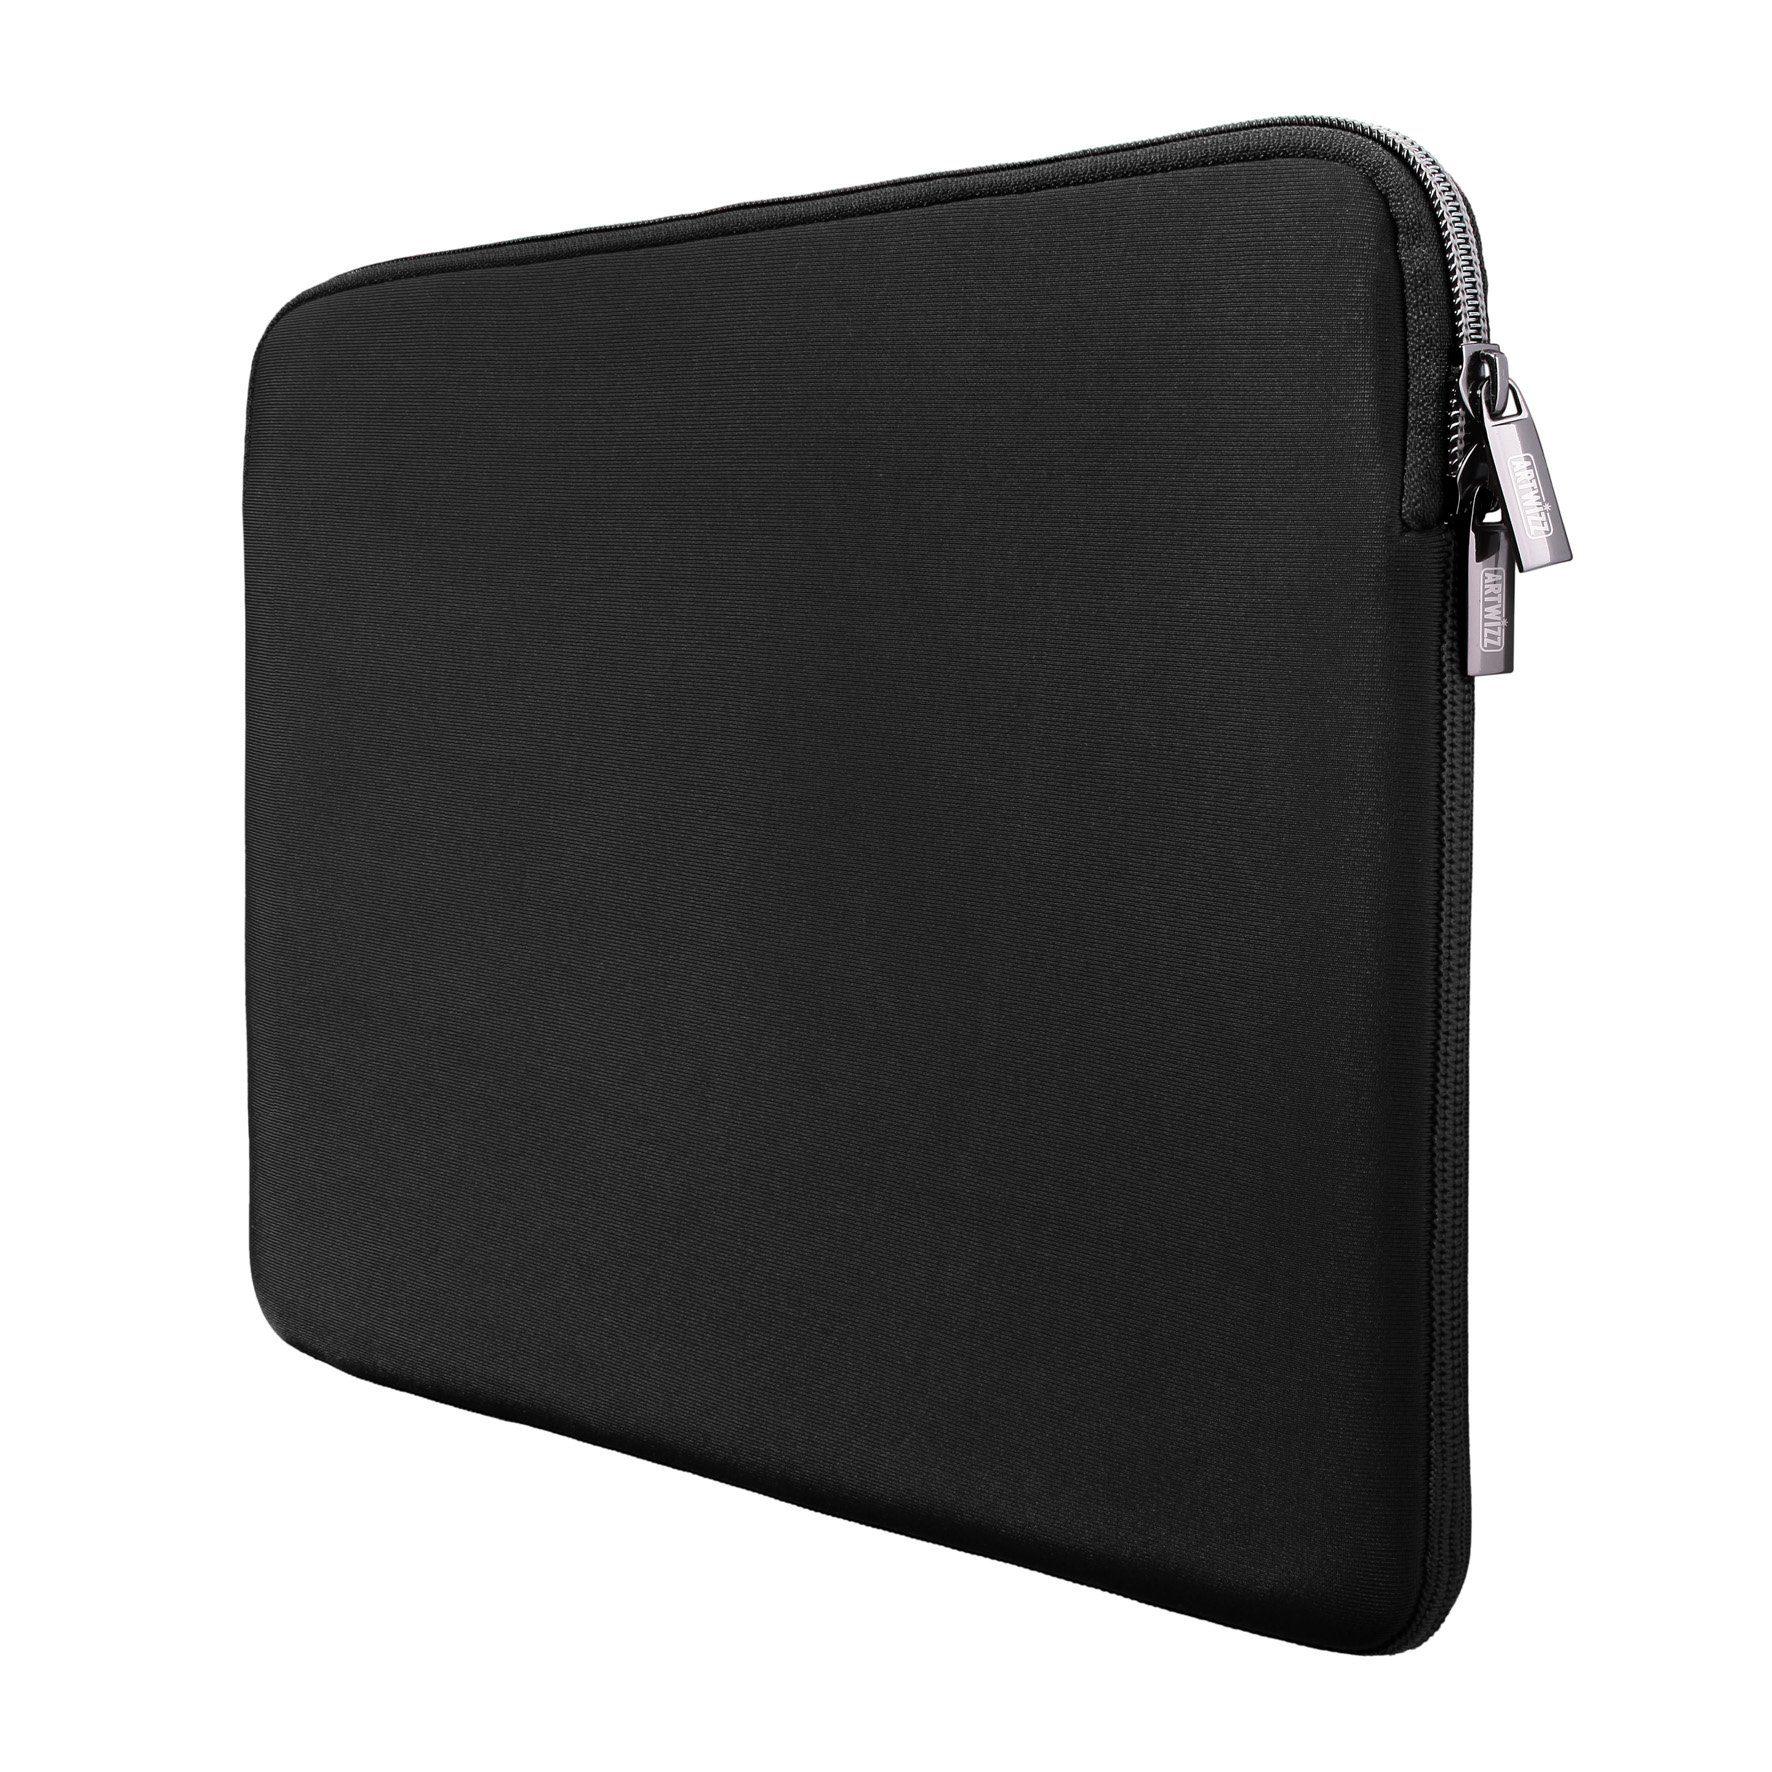 Artwizz Neoprenhülle für MacBook Air 13, -Pro 13 »Neoprene Sleeve«